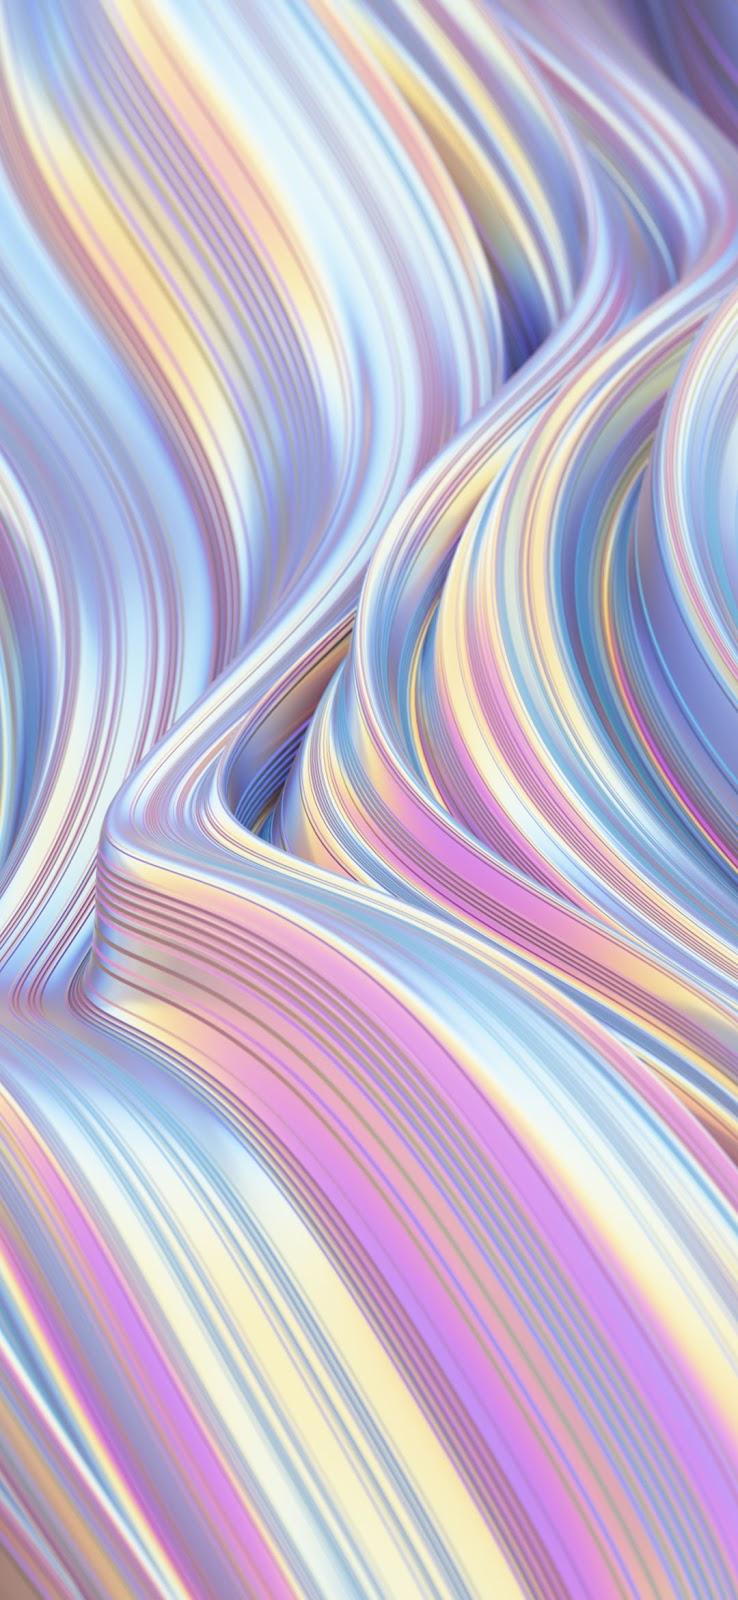 abstract silk pink waves wallpaper